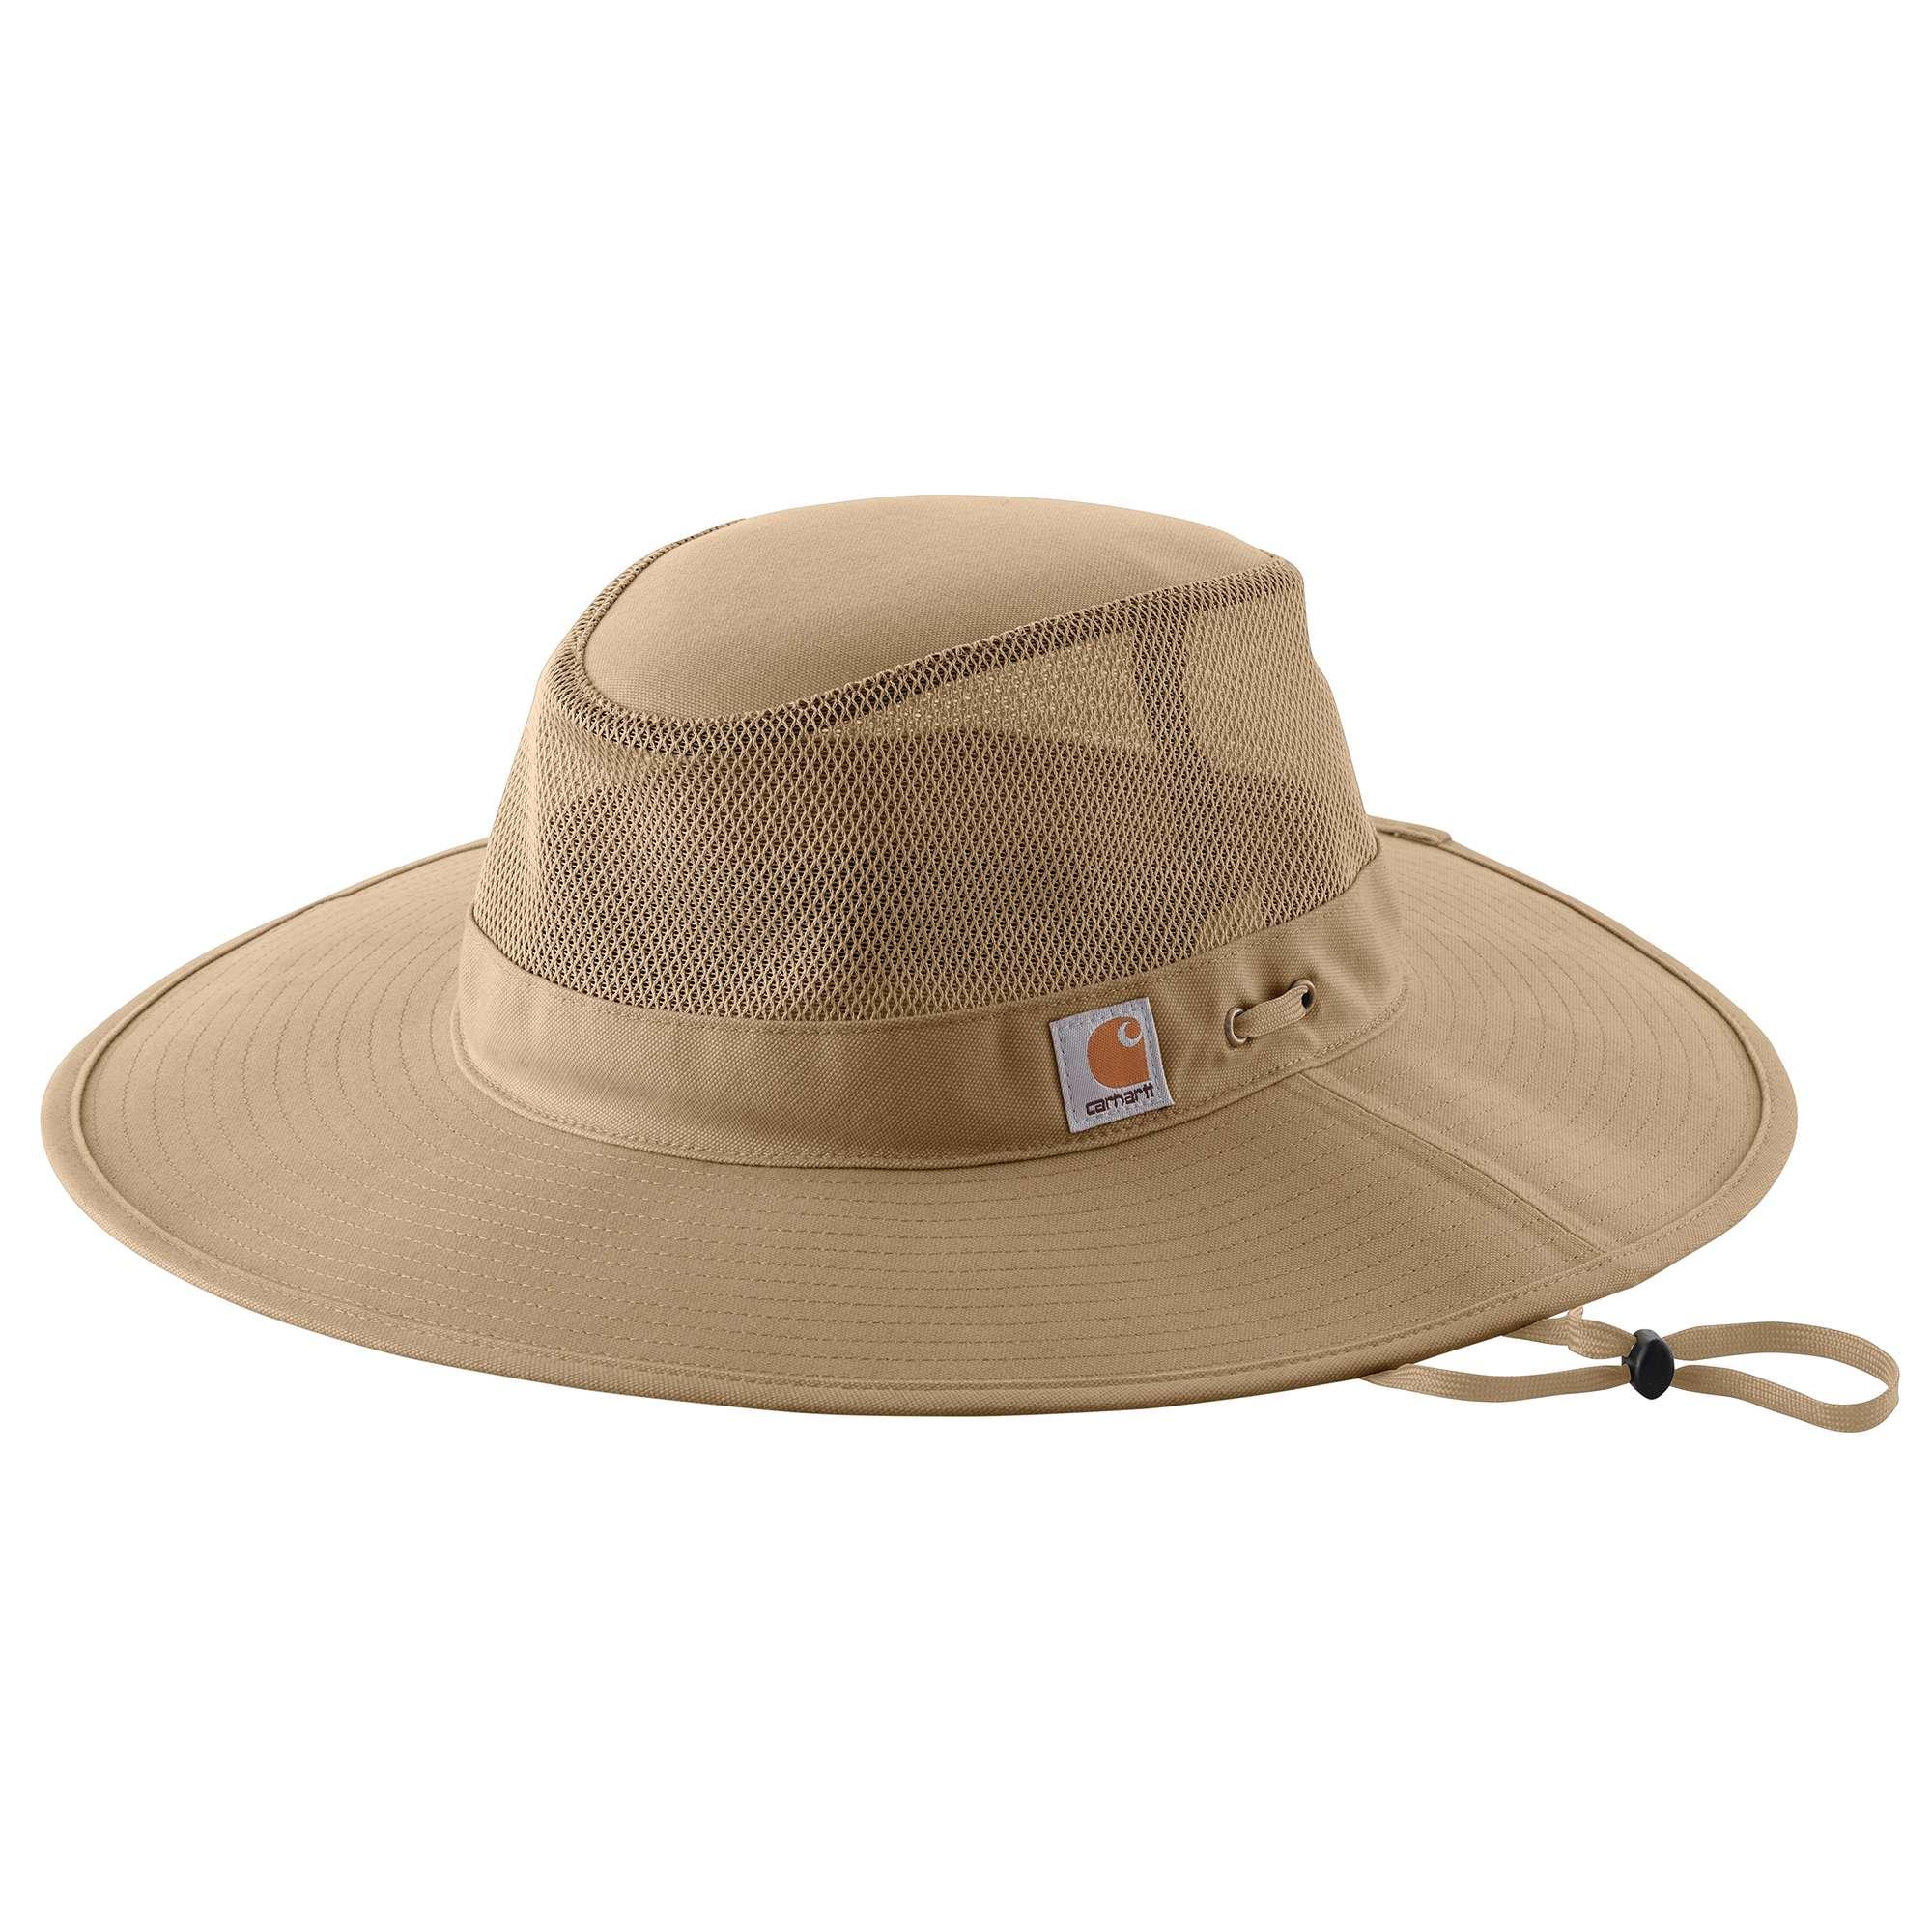 a67a7eb516687 Buy Womens Odessa Sun Hat - Carhartt Online at Best price - TN